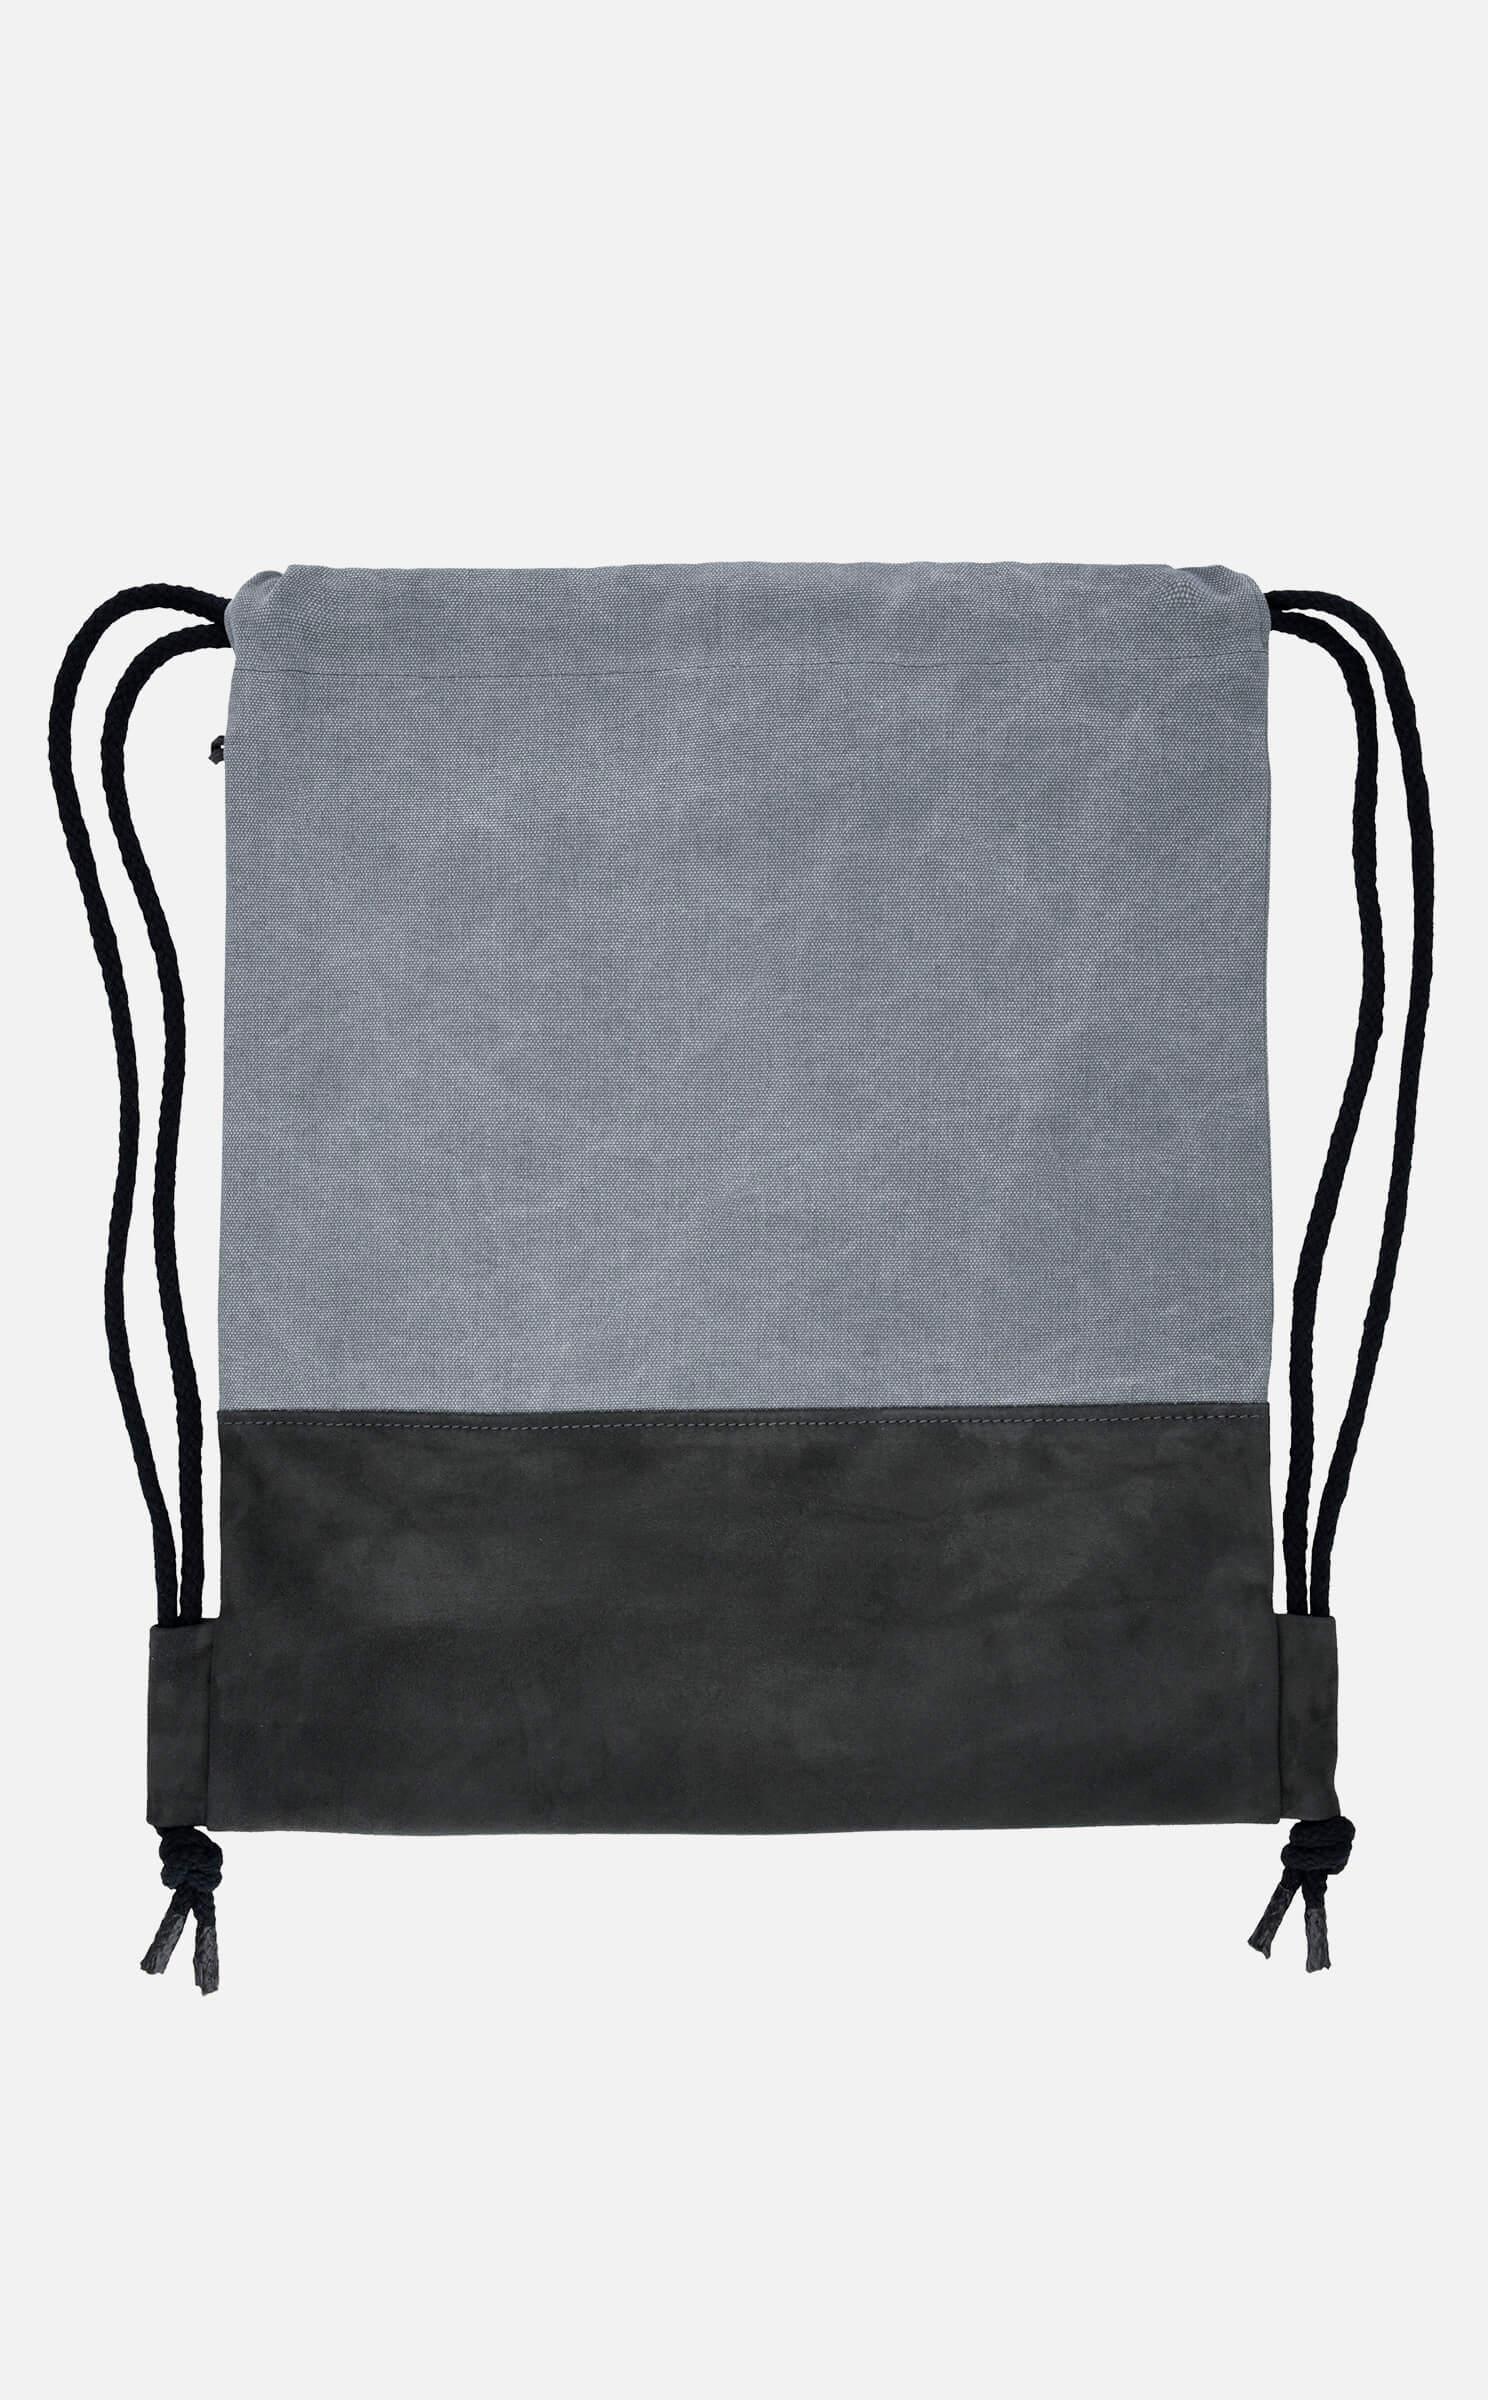 Stoff Leder Turnbeutel in Canvas Grau